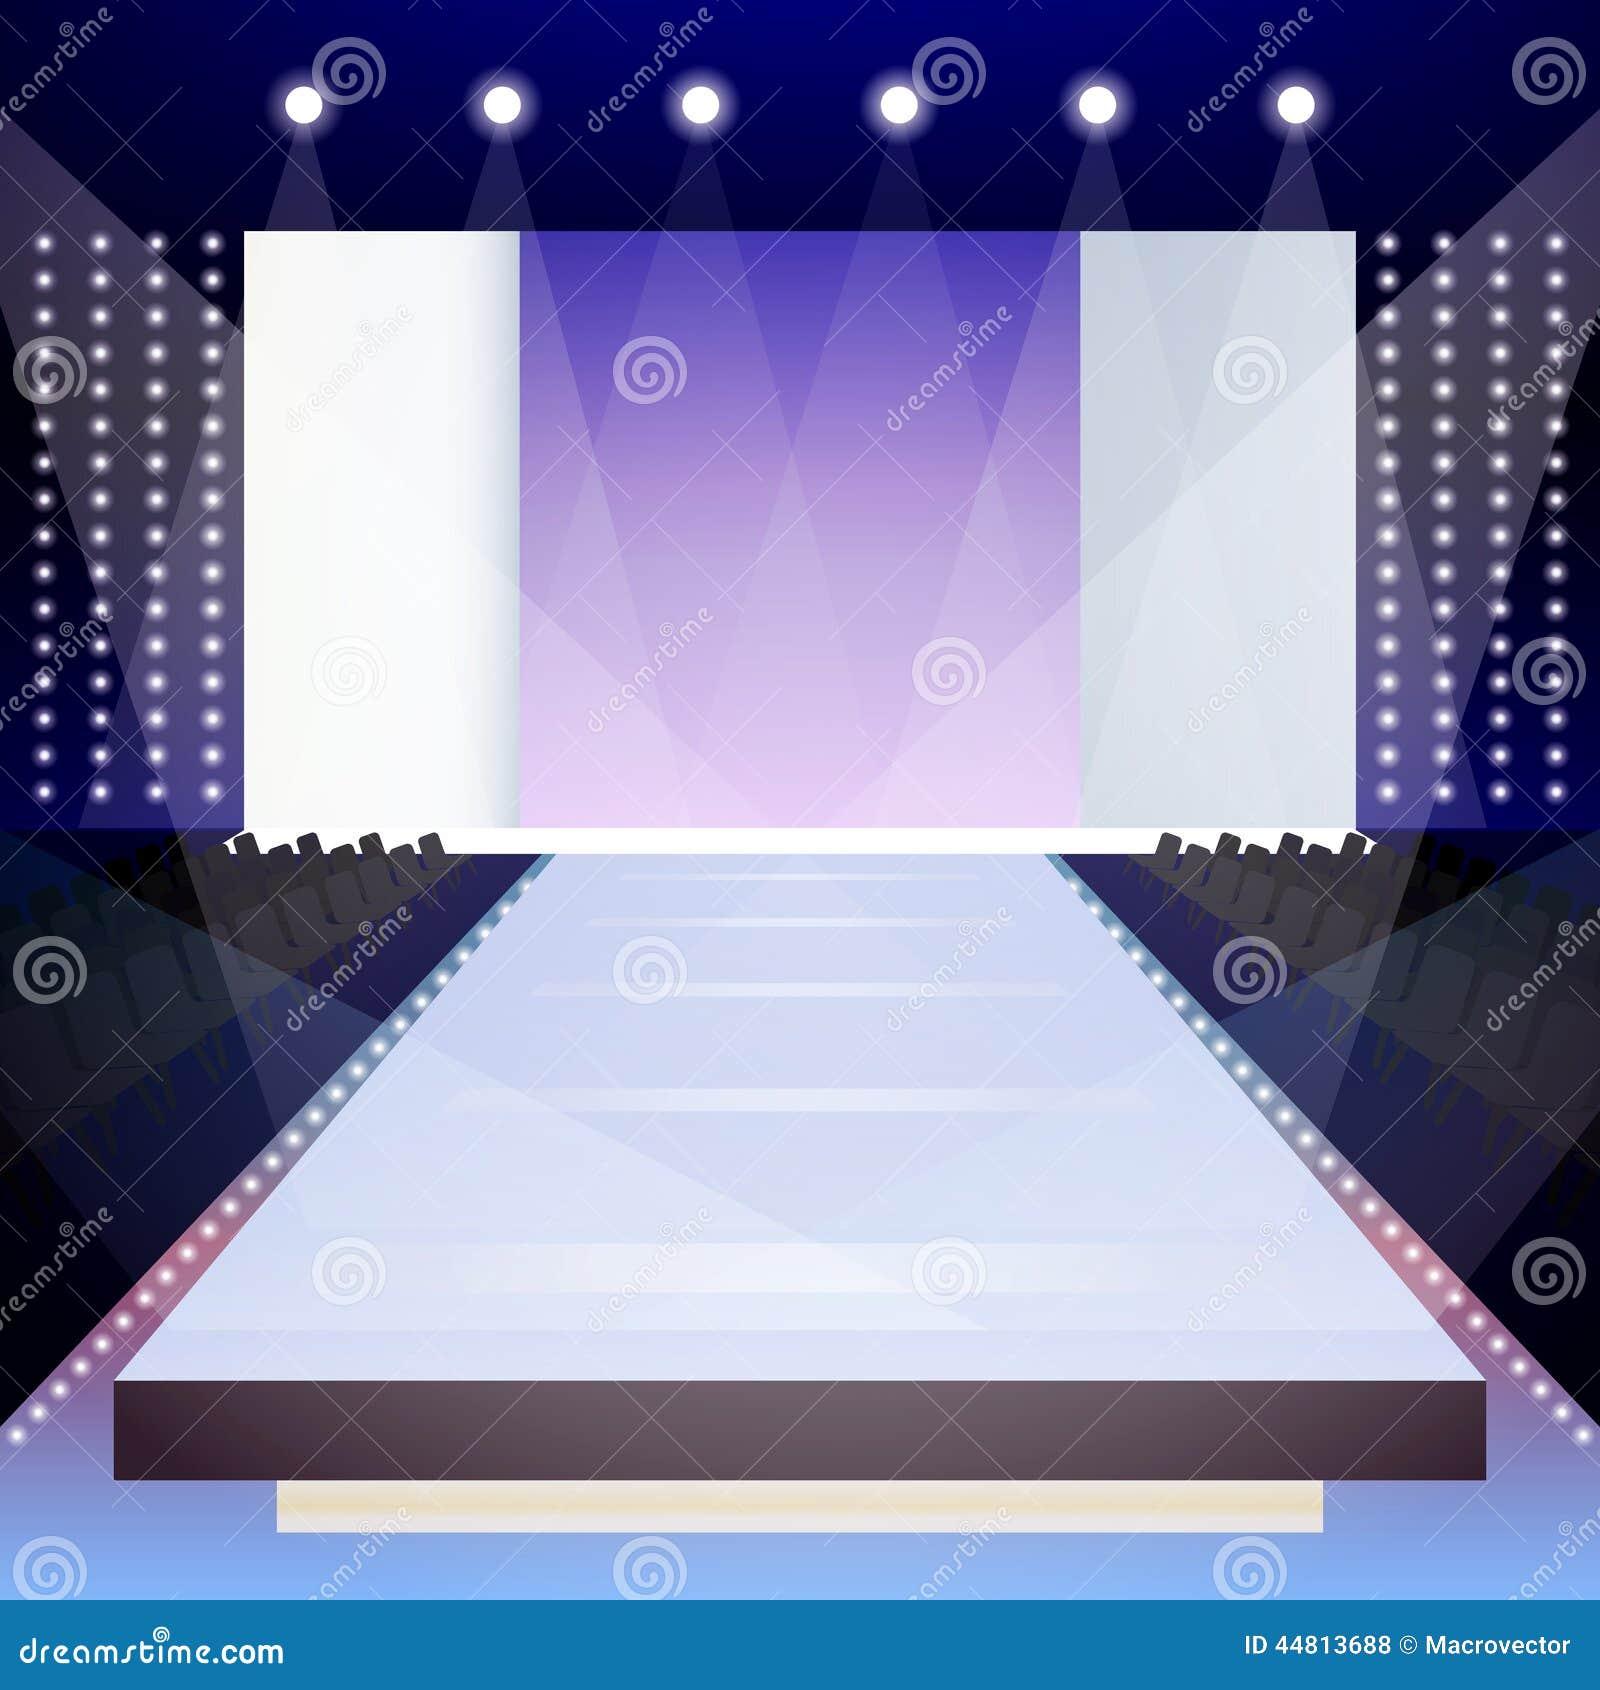 Fashion Runway Poster Empty Illuminated Scene Designer Presentation Vector Illustration Royalty Free